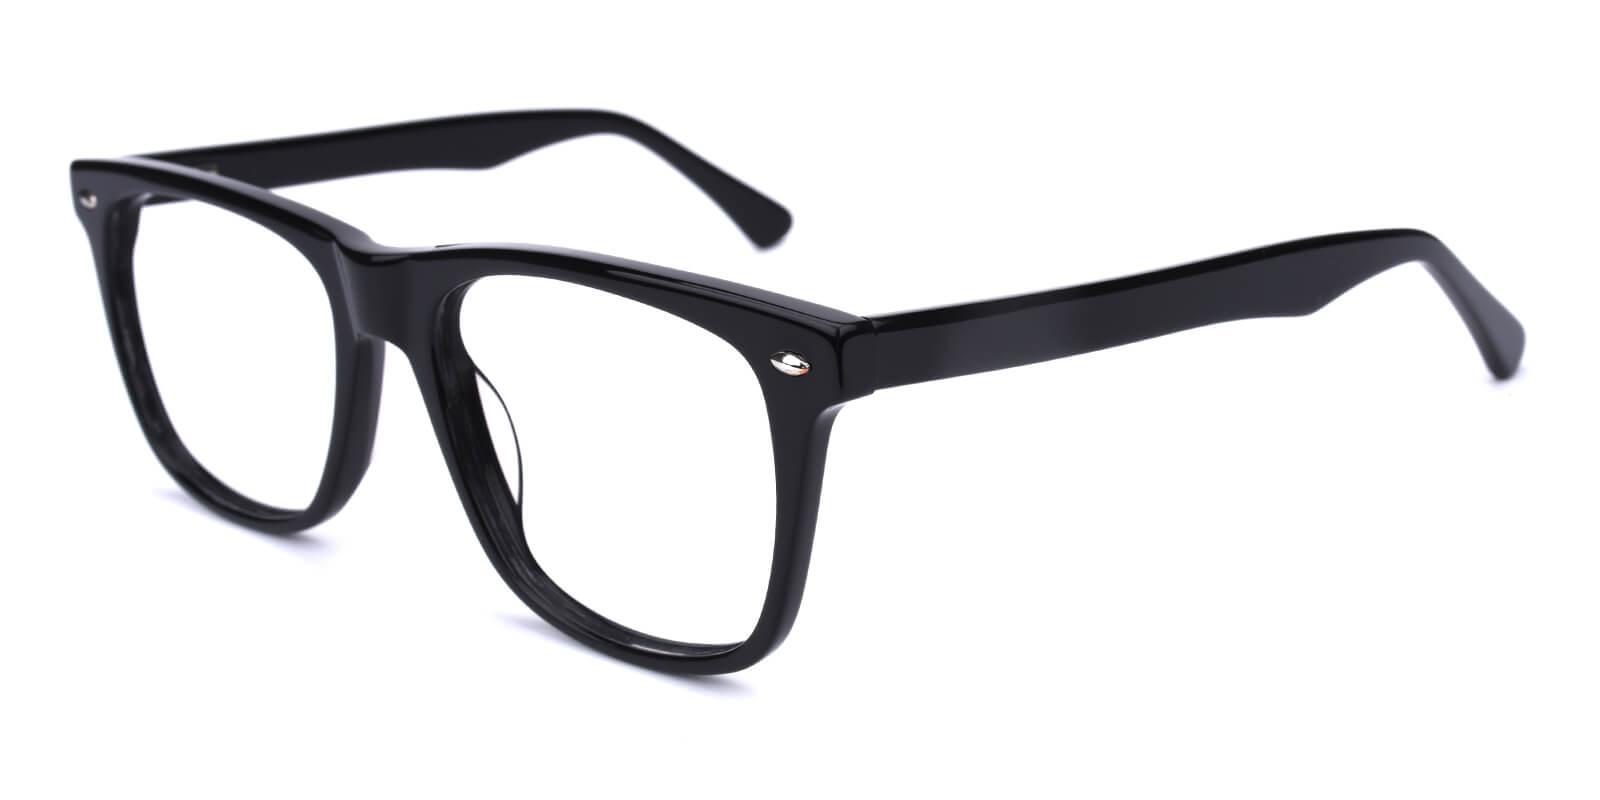 Bridinry-Black-Square-Acetate-Eyeglasses-additional1